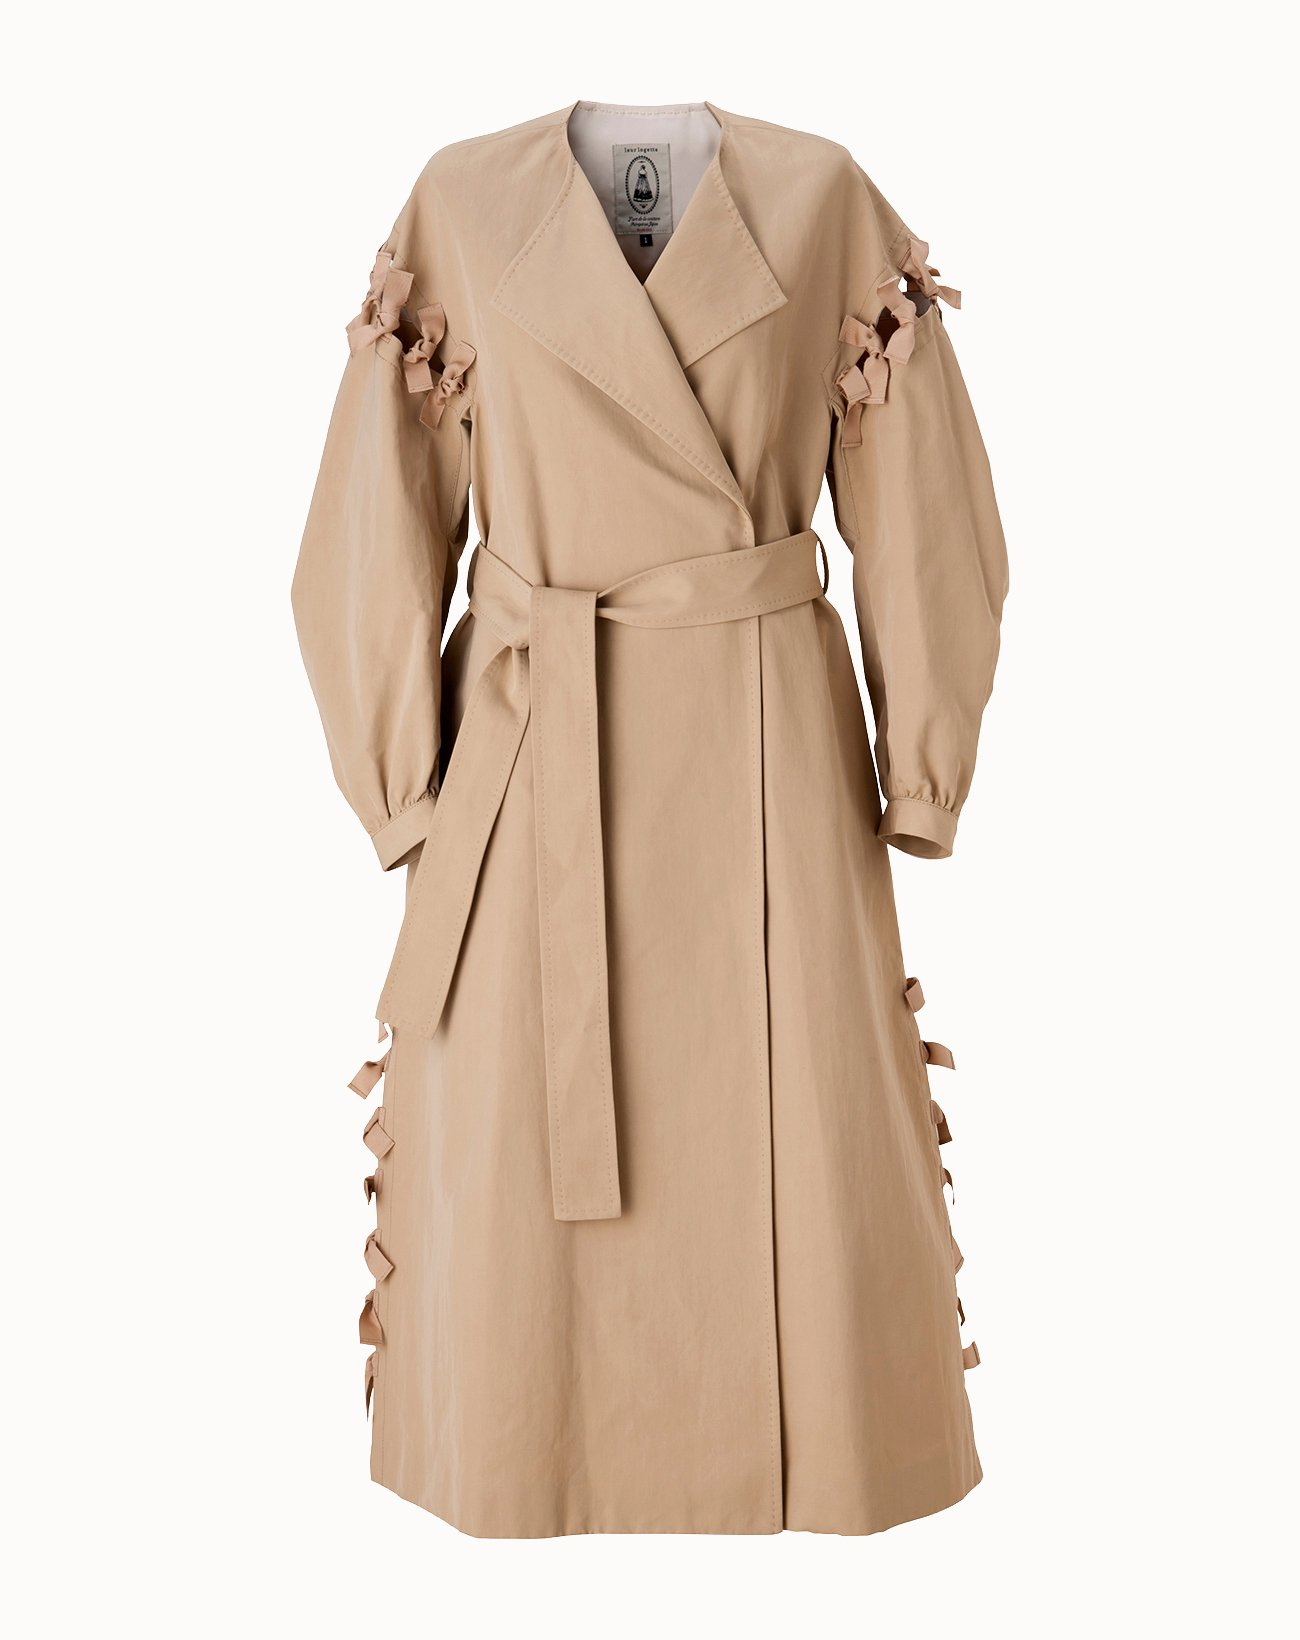 leur logette - Vintage Twill Coat - Beige